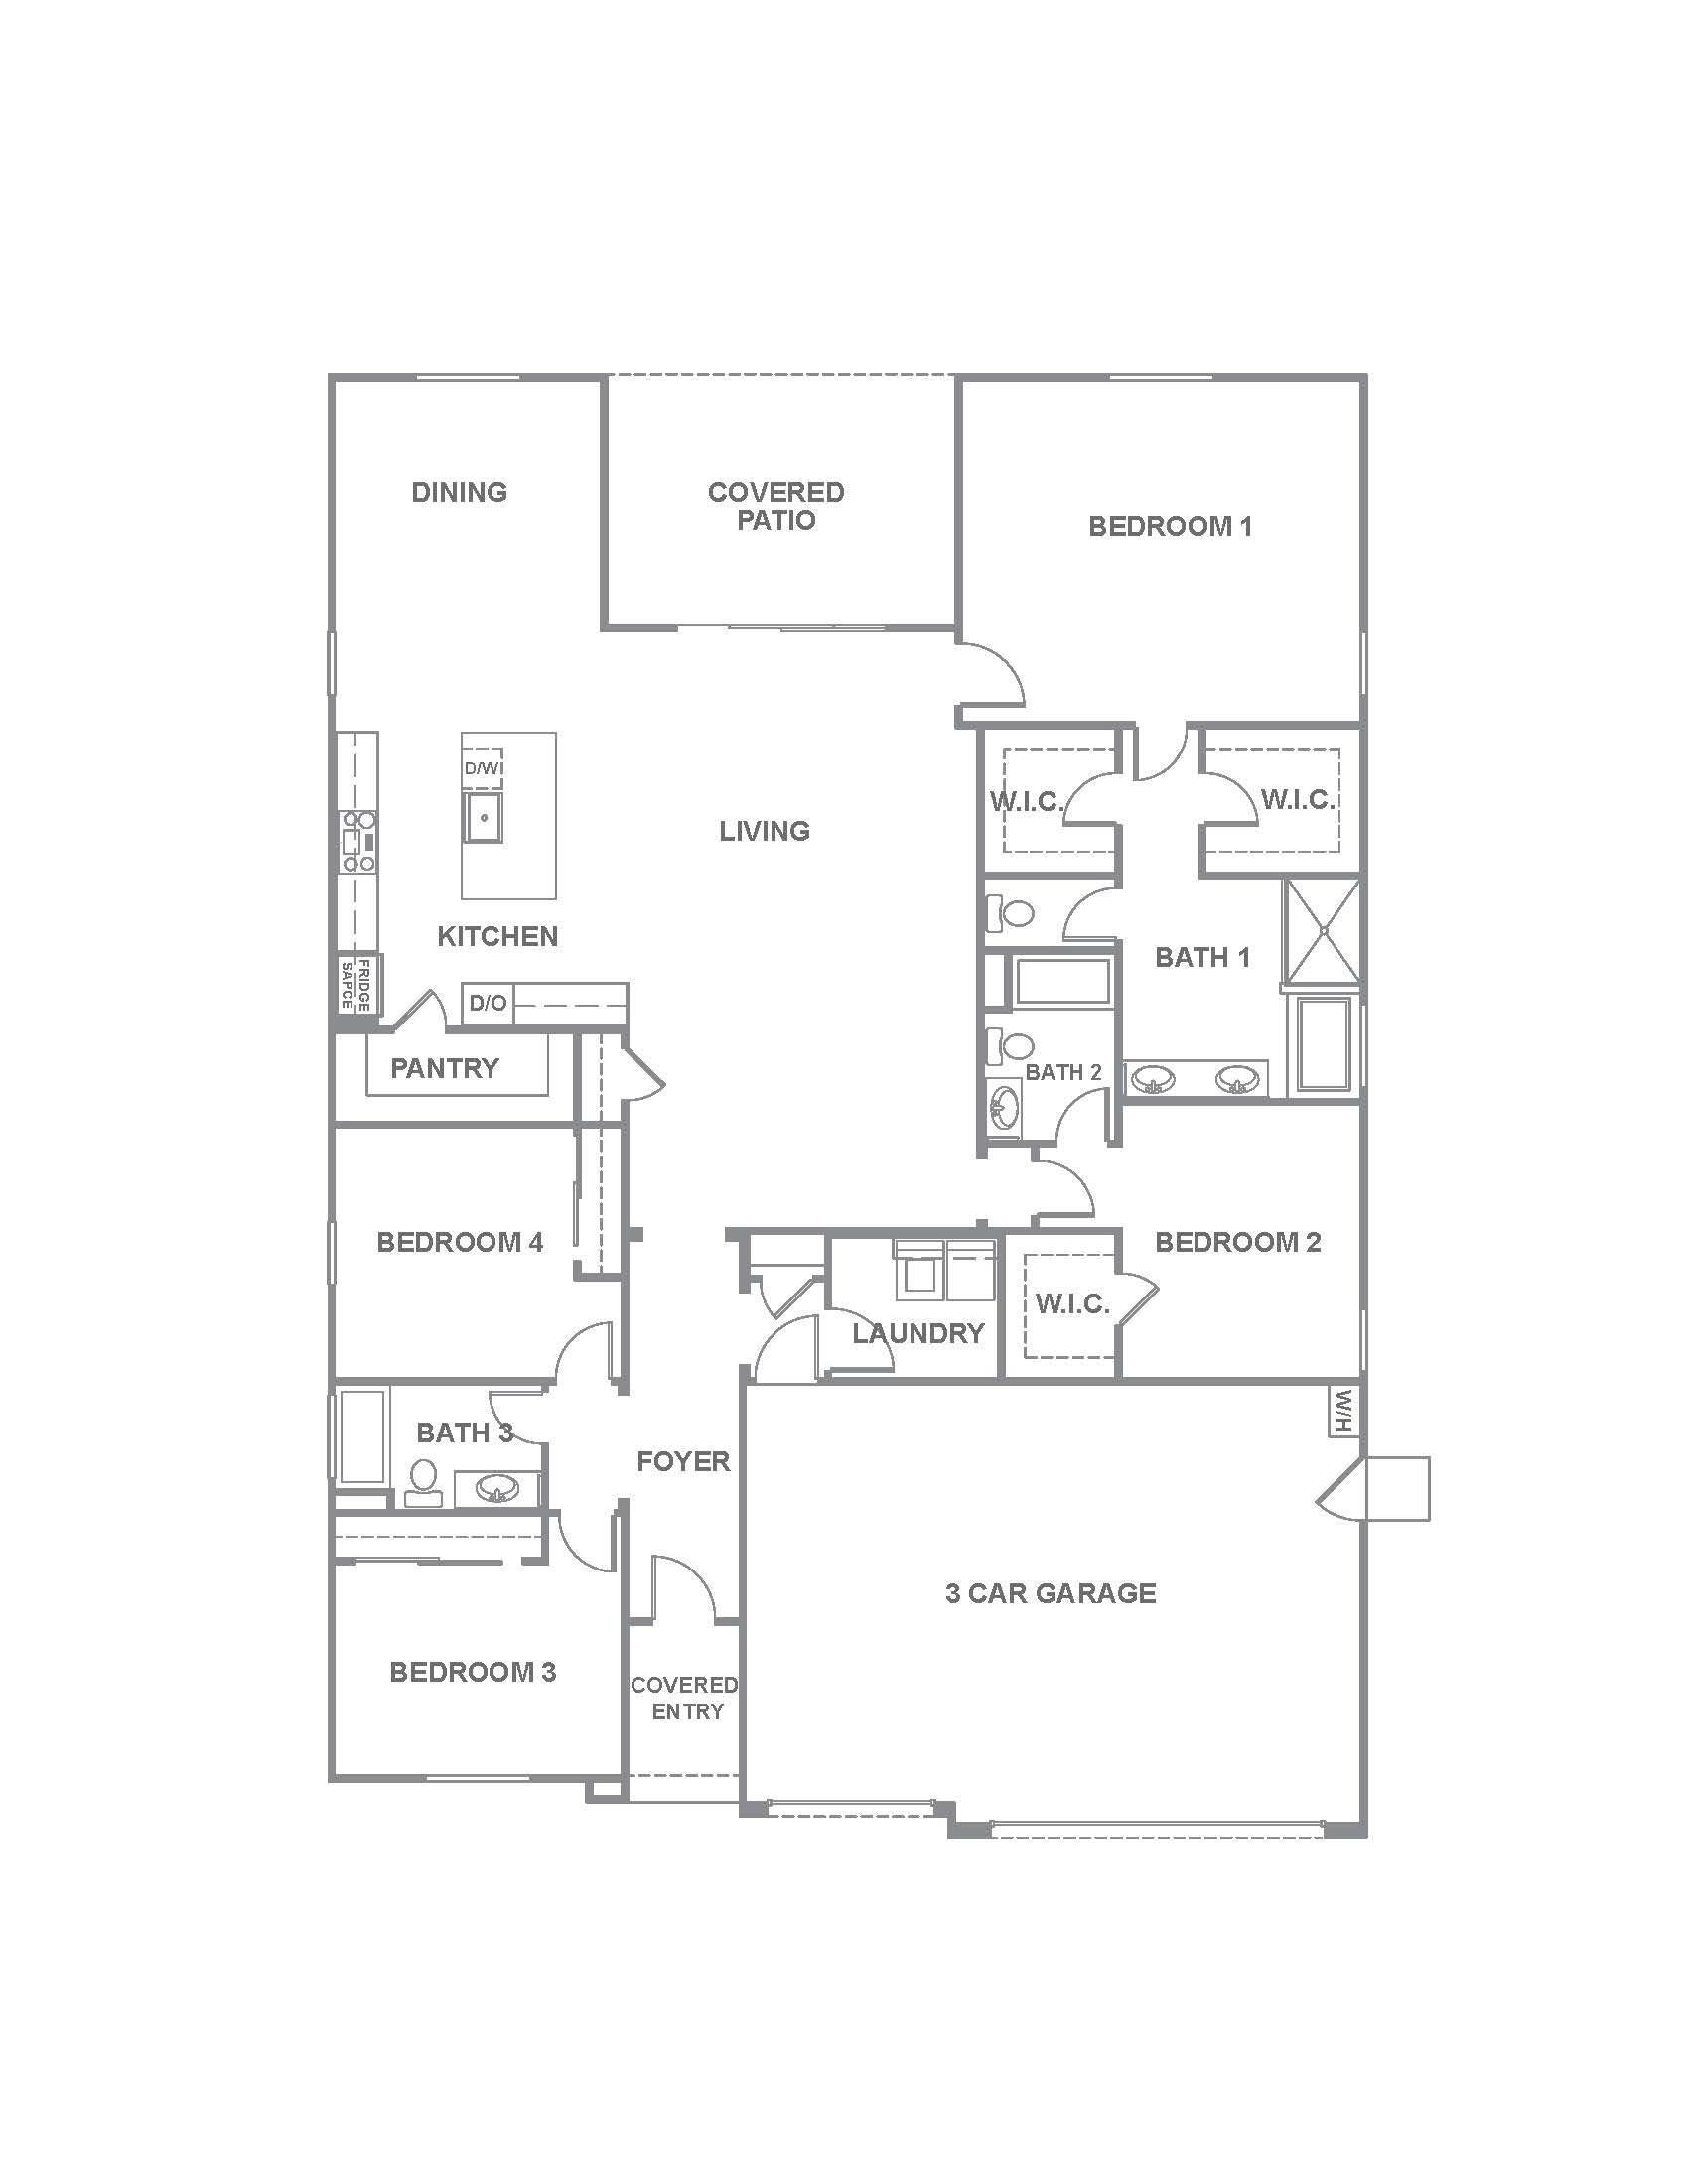 2538 Plan Plan At Adalyn Manor In Las Vegas Nv By D R Horton